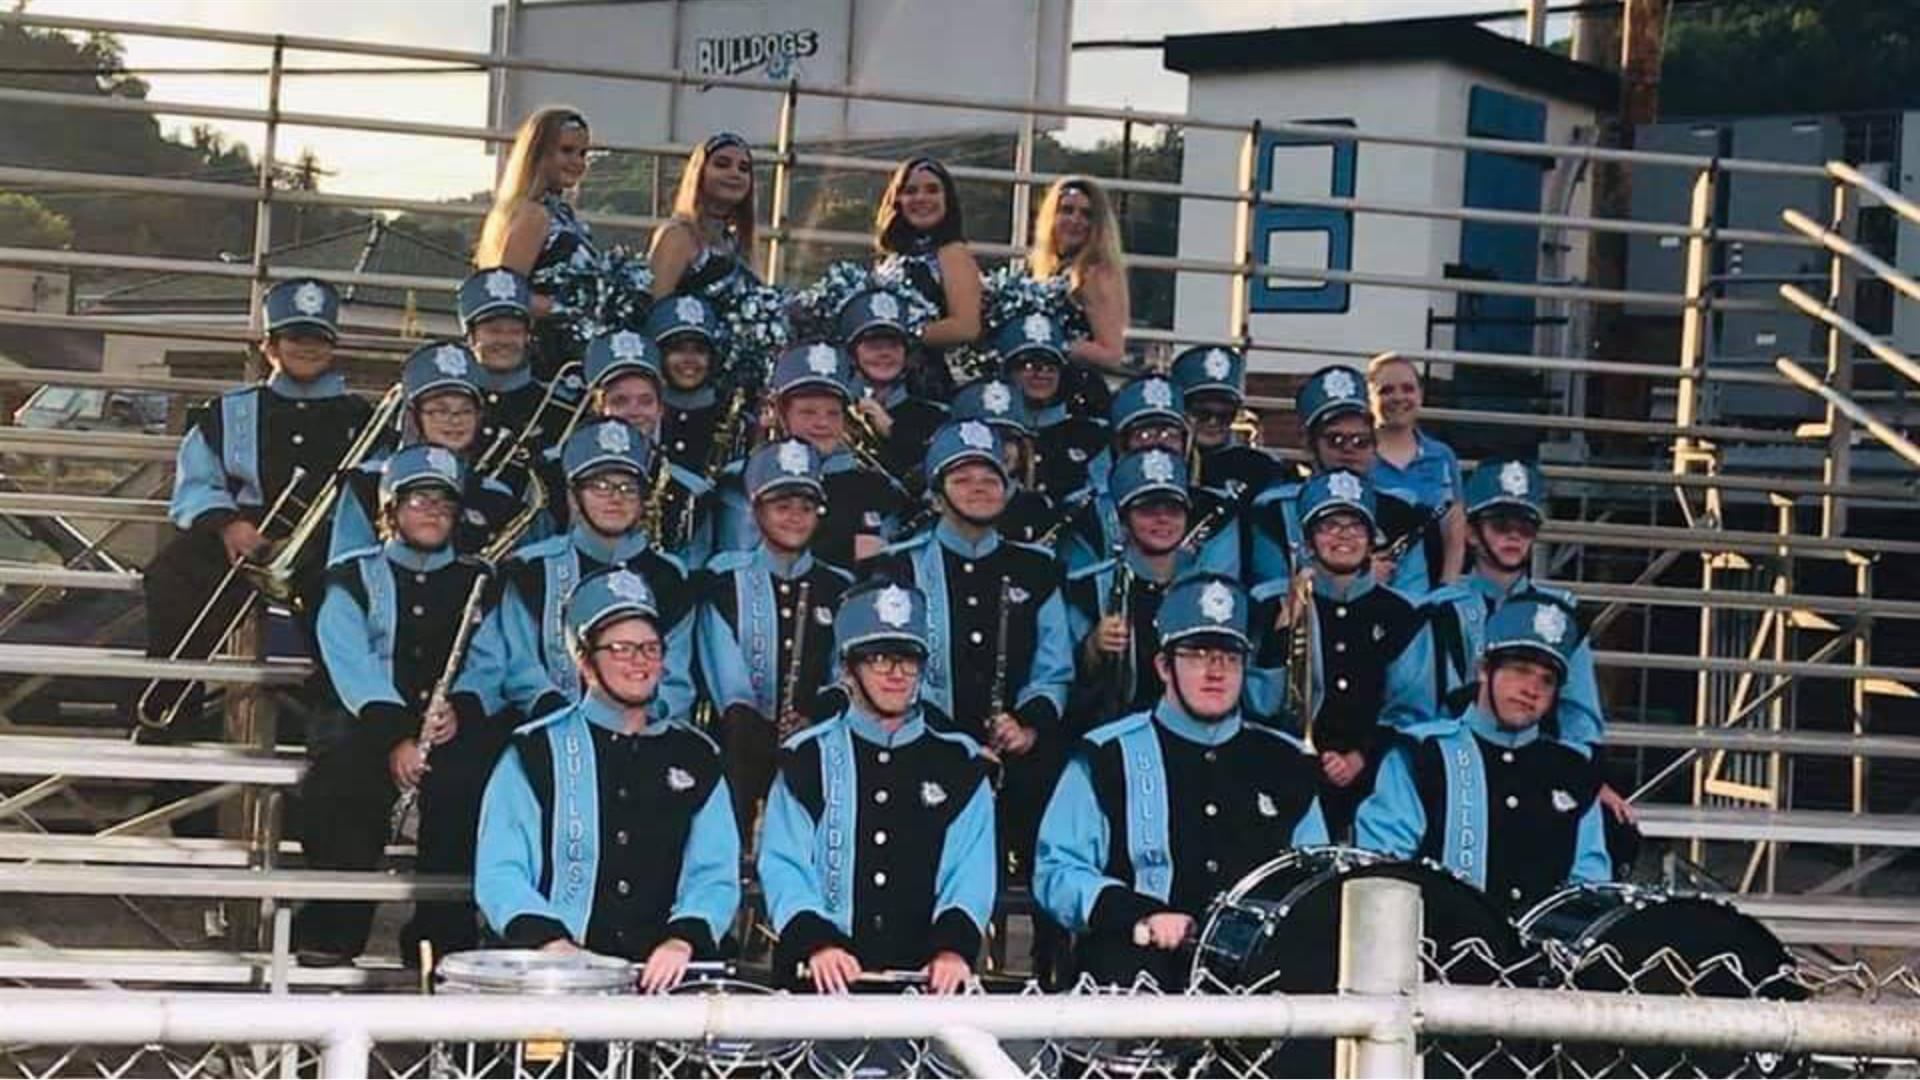 Bridgeport Marching Band 2019-2020